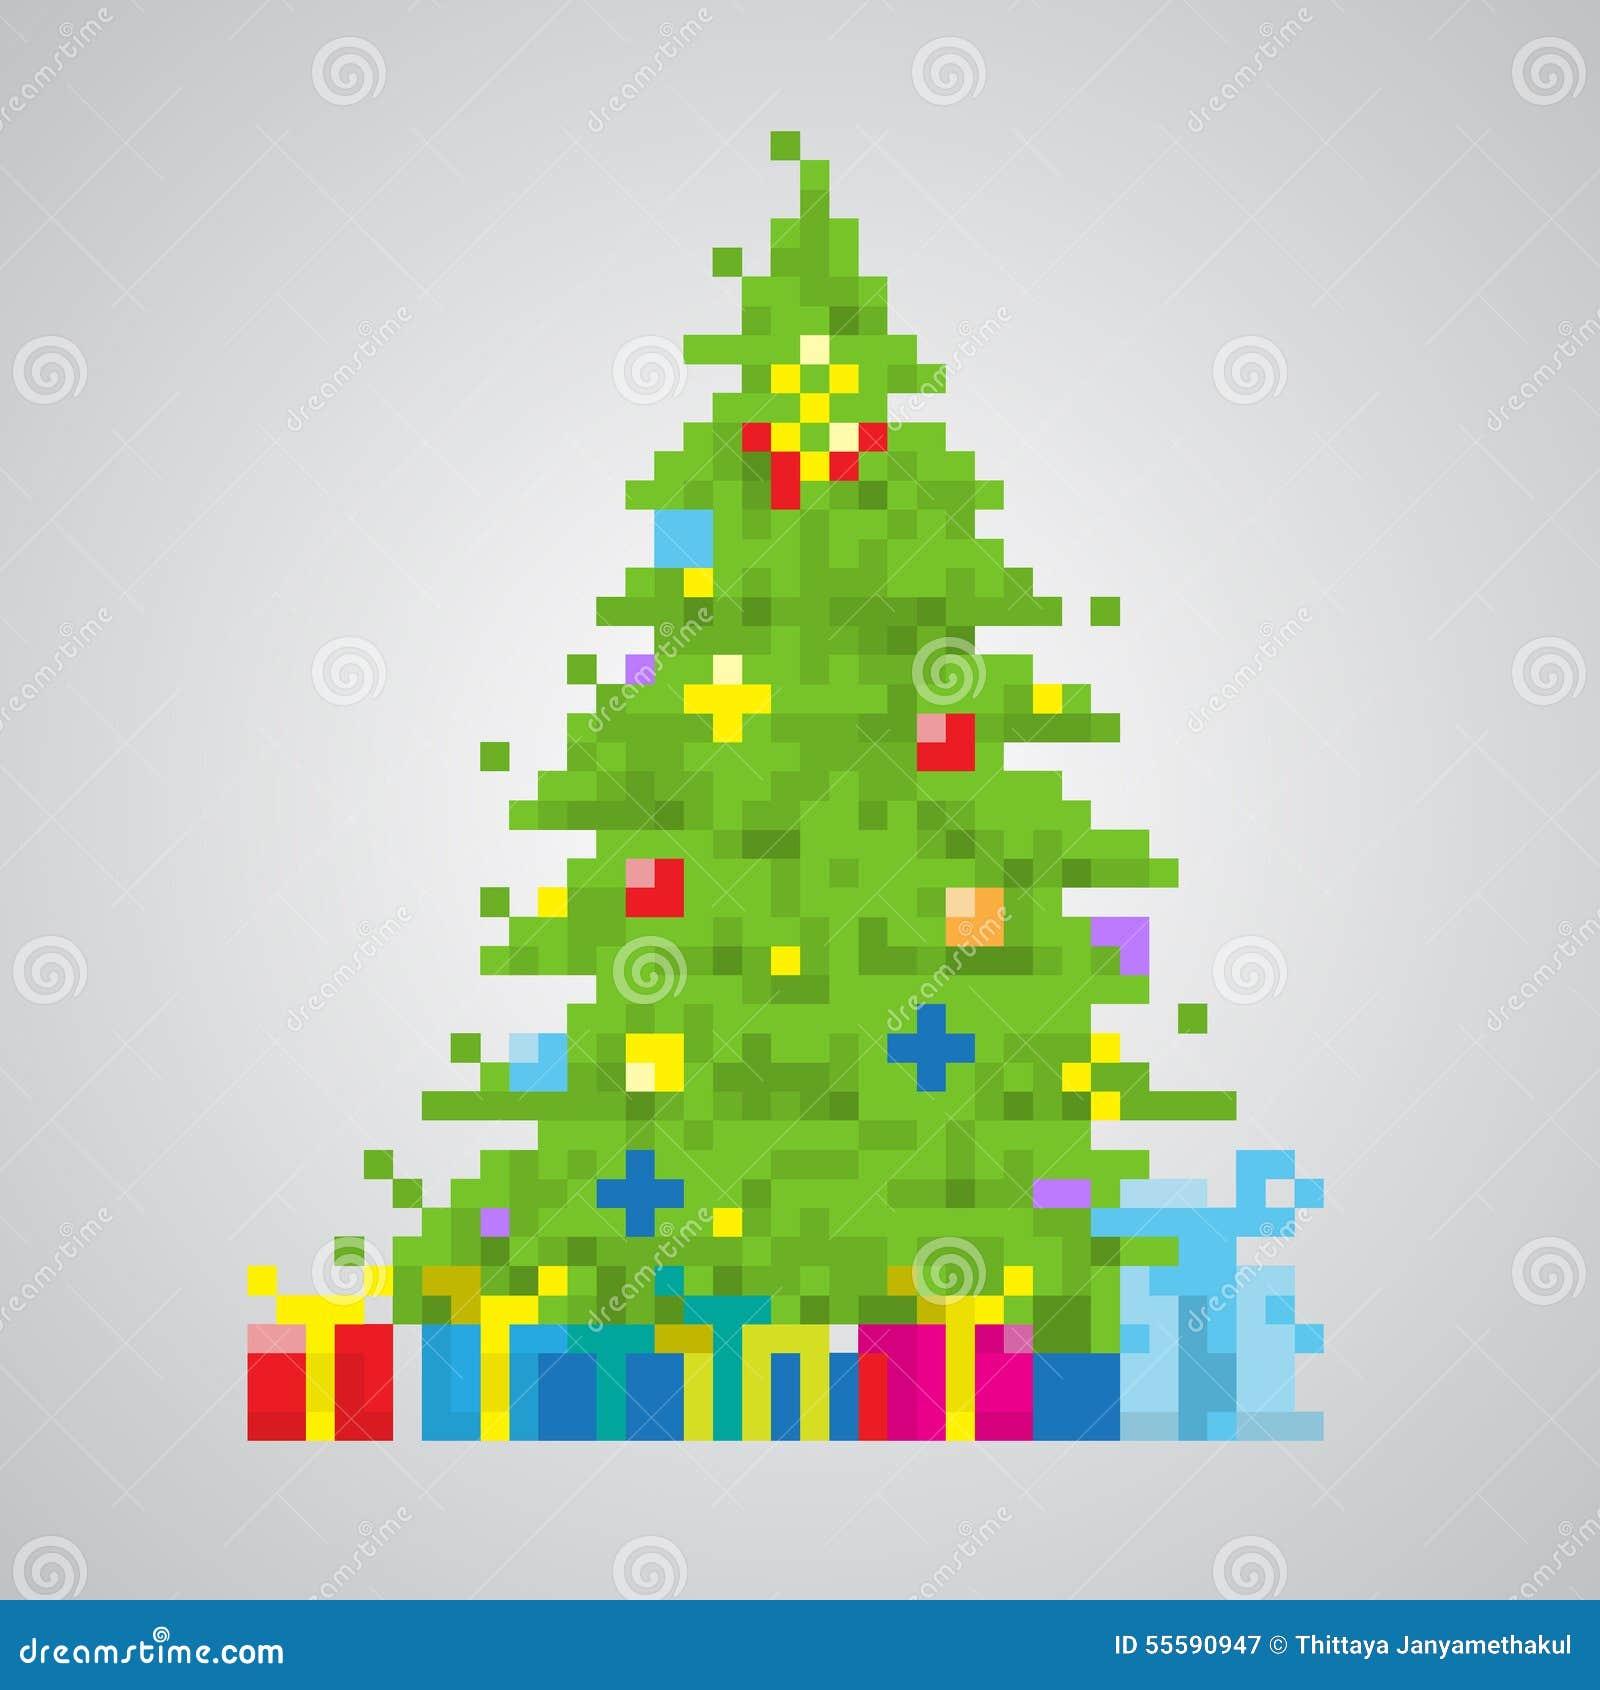 Christmas Tree 8-bit Pixel Style Vector Stock Vector - Image: 55590947